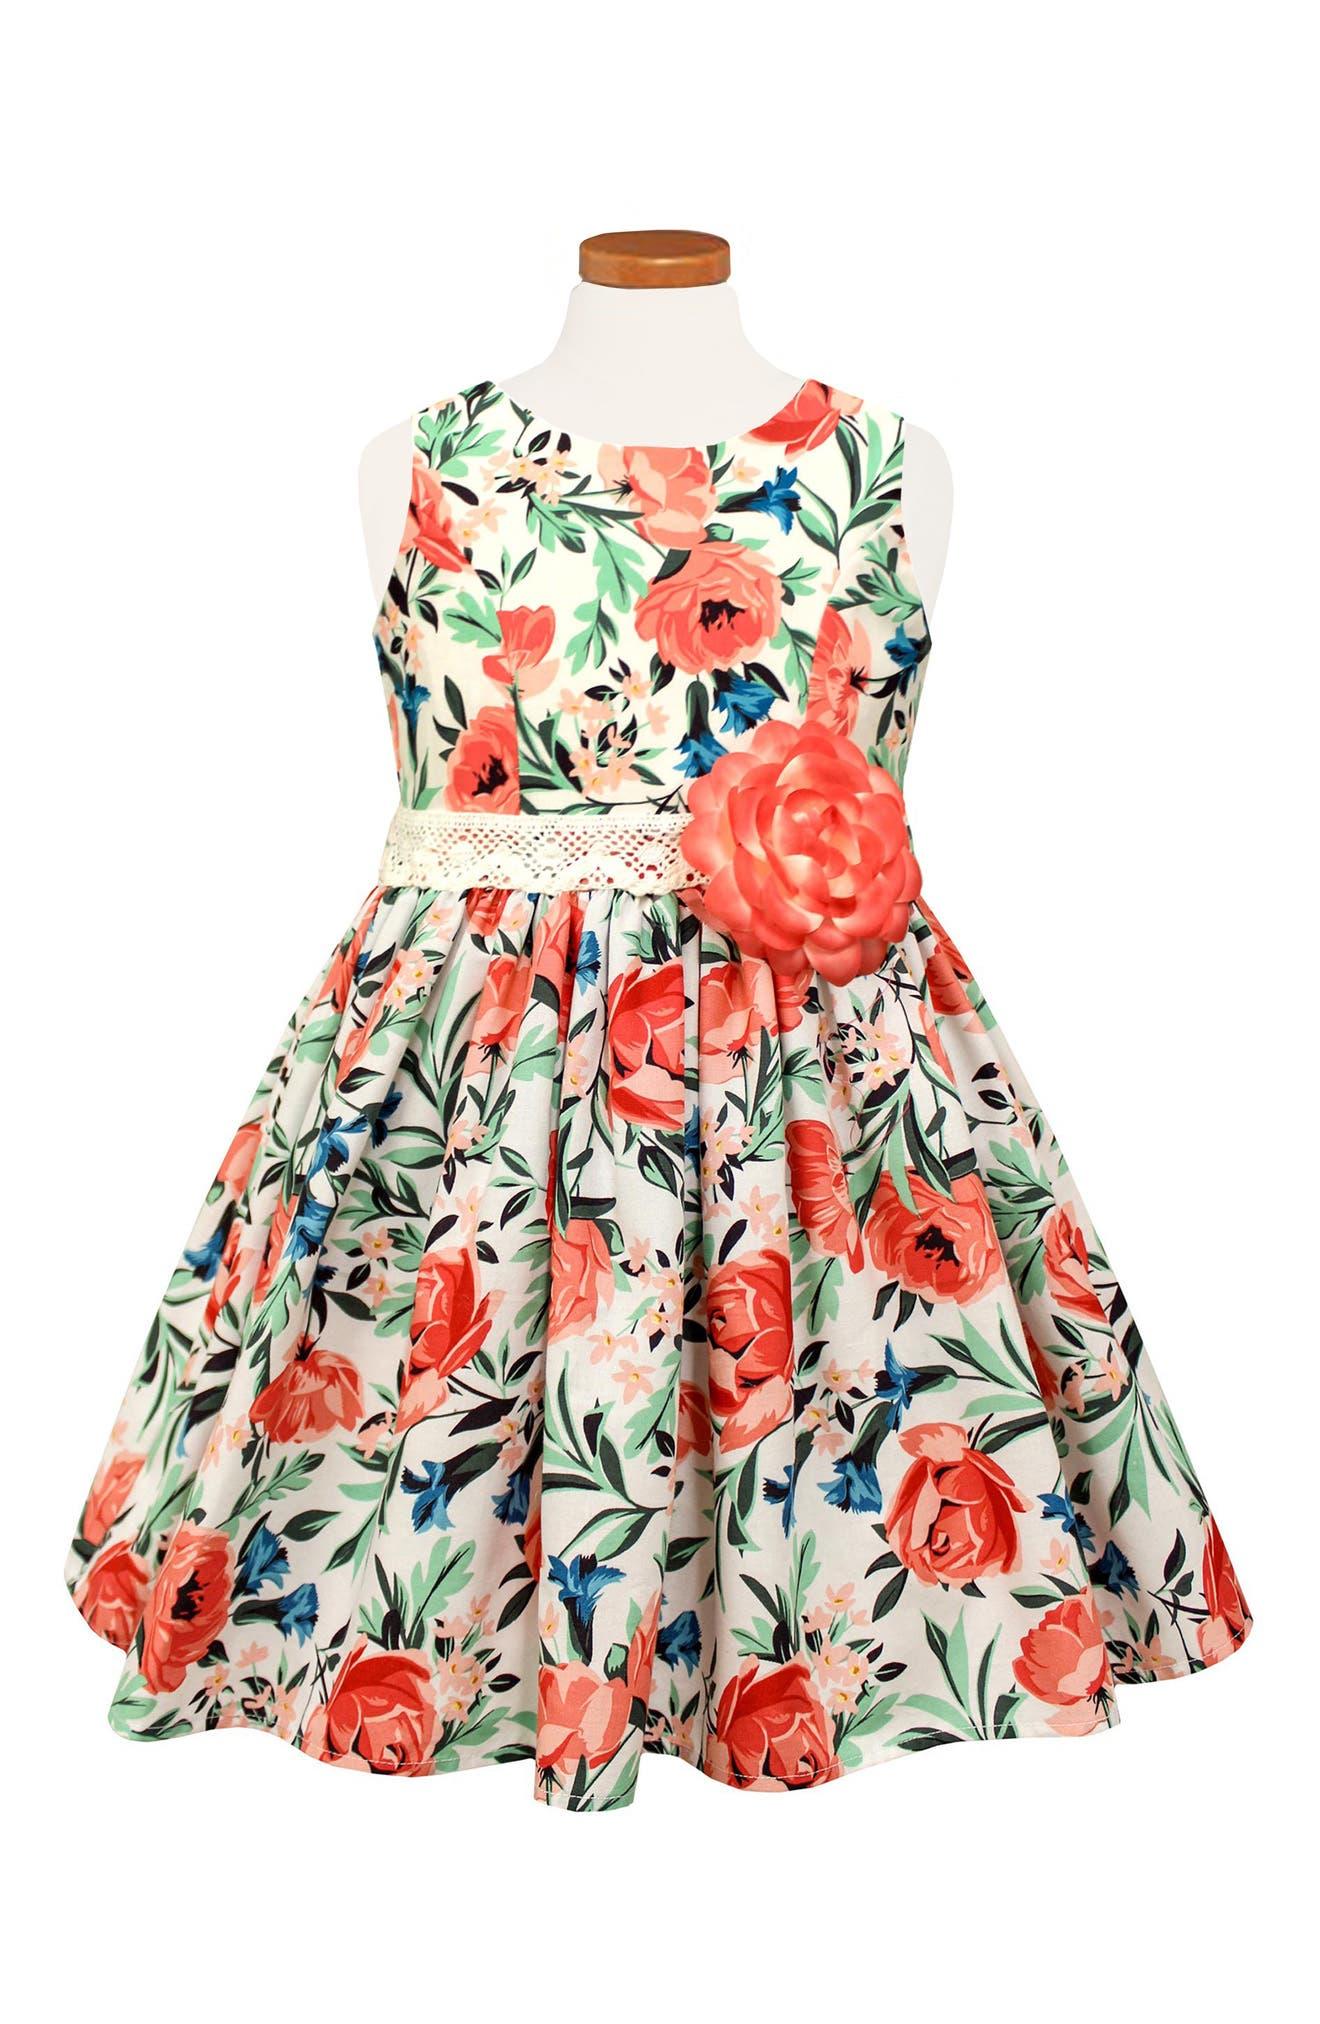 Floral Print Sleeveless Dress,                             Main thumbnail 1, color,                             820